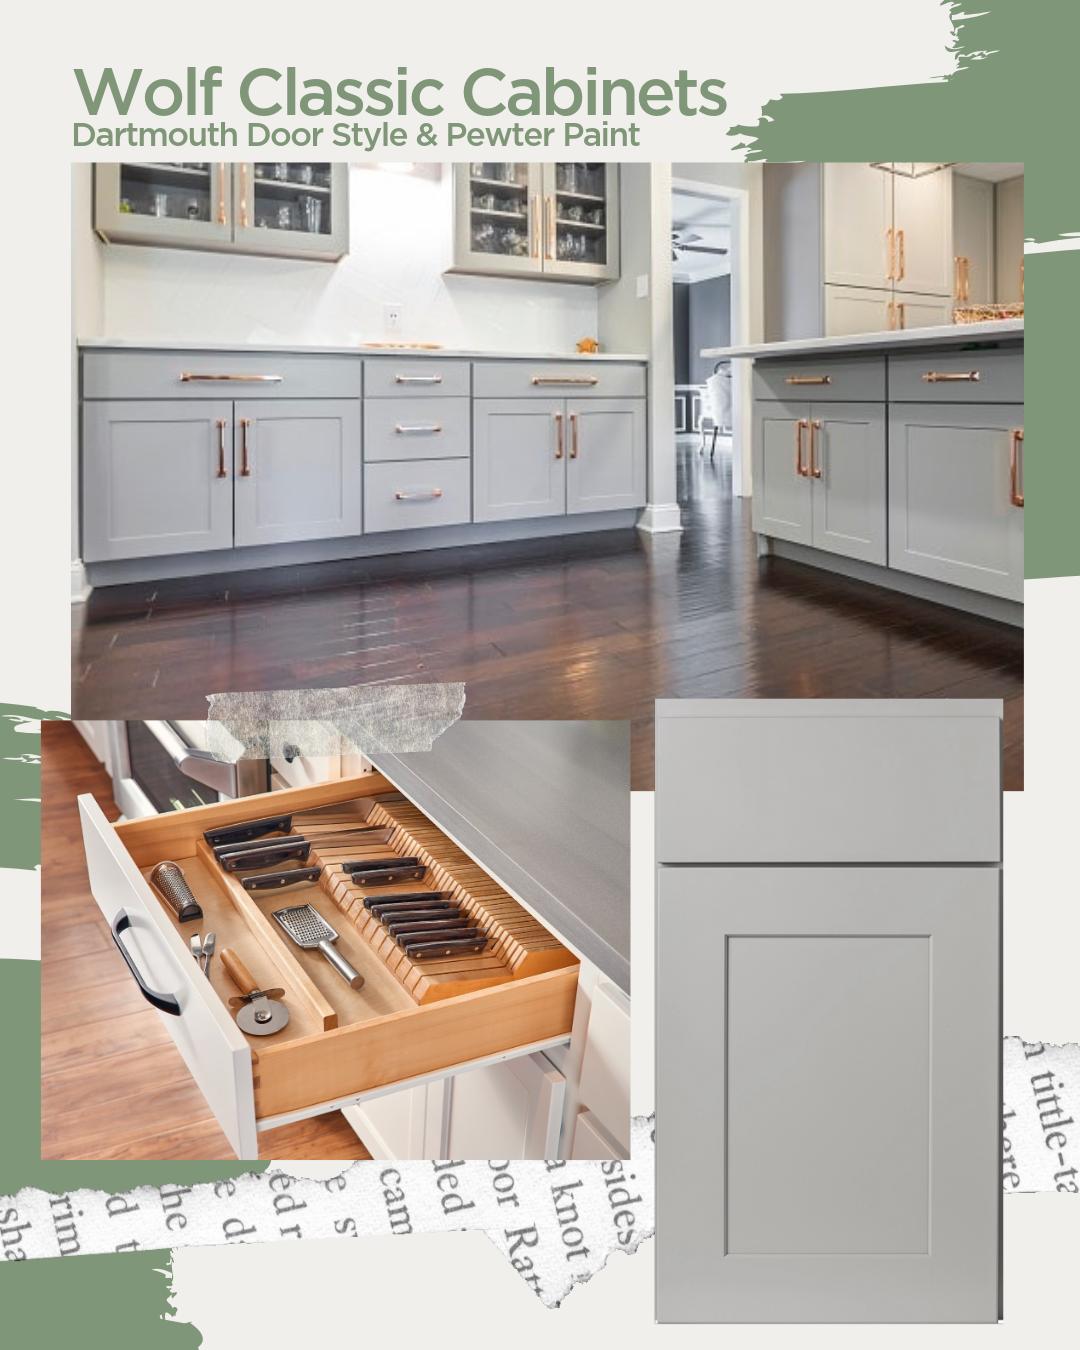 Wolf Classic Kitchen Kitchen design, Classic